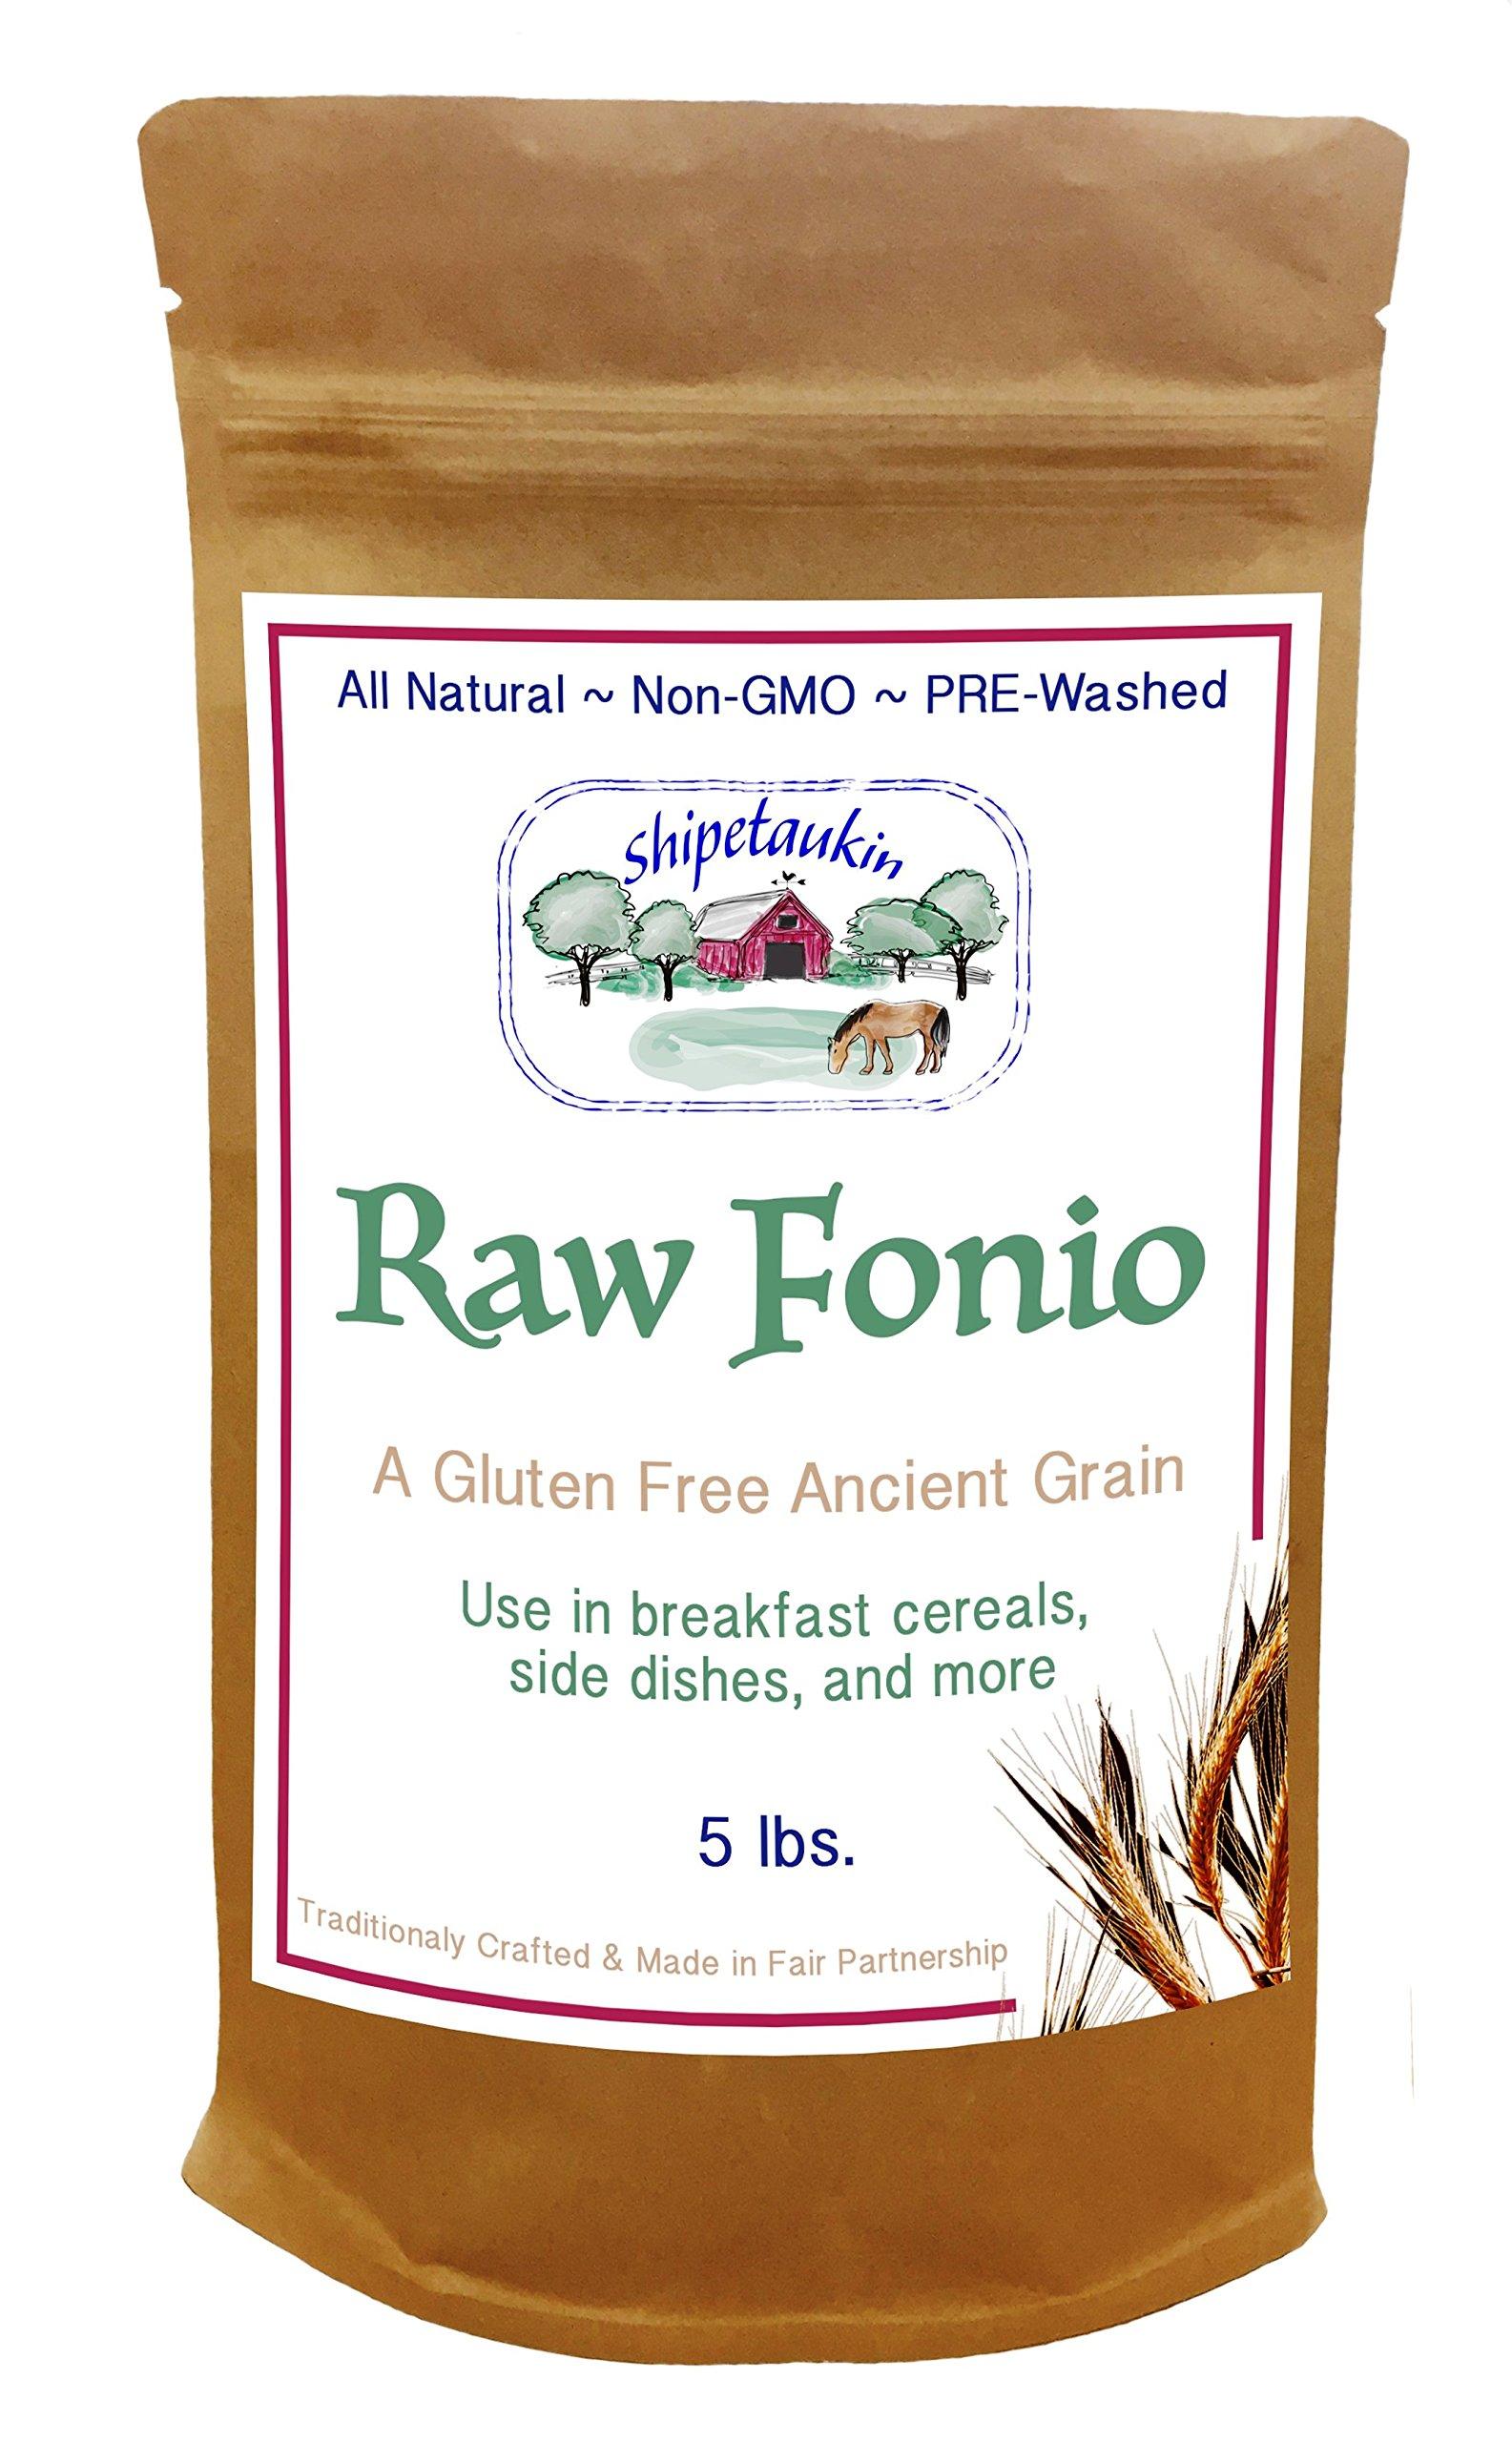 Shipetaukin Raw Fonio Gluten Free Ancient African Grain, 5 Lbs.